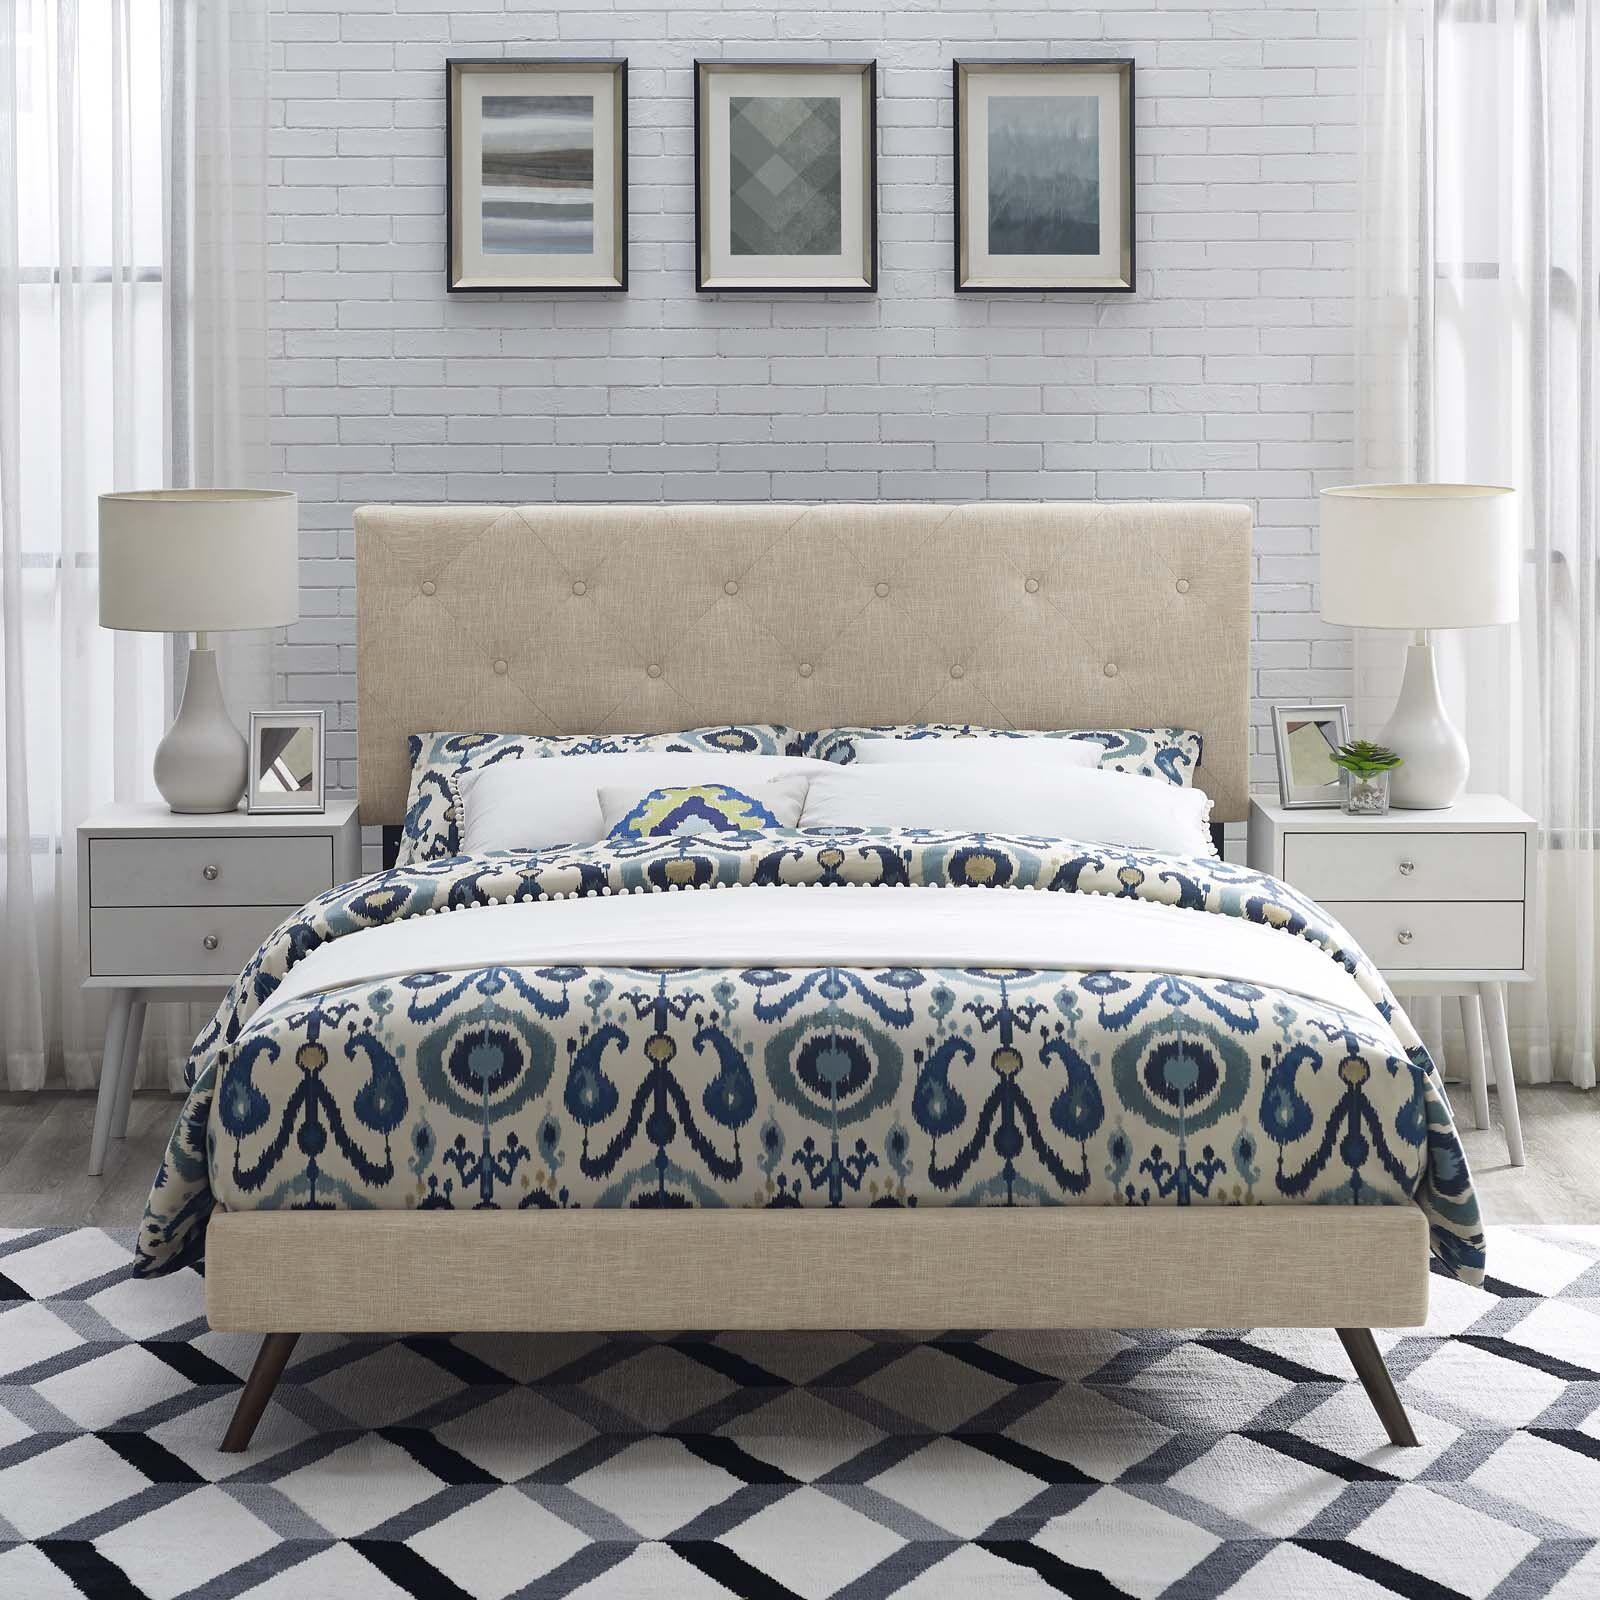 Perrinton Upholstered Platform Bed Size: King